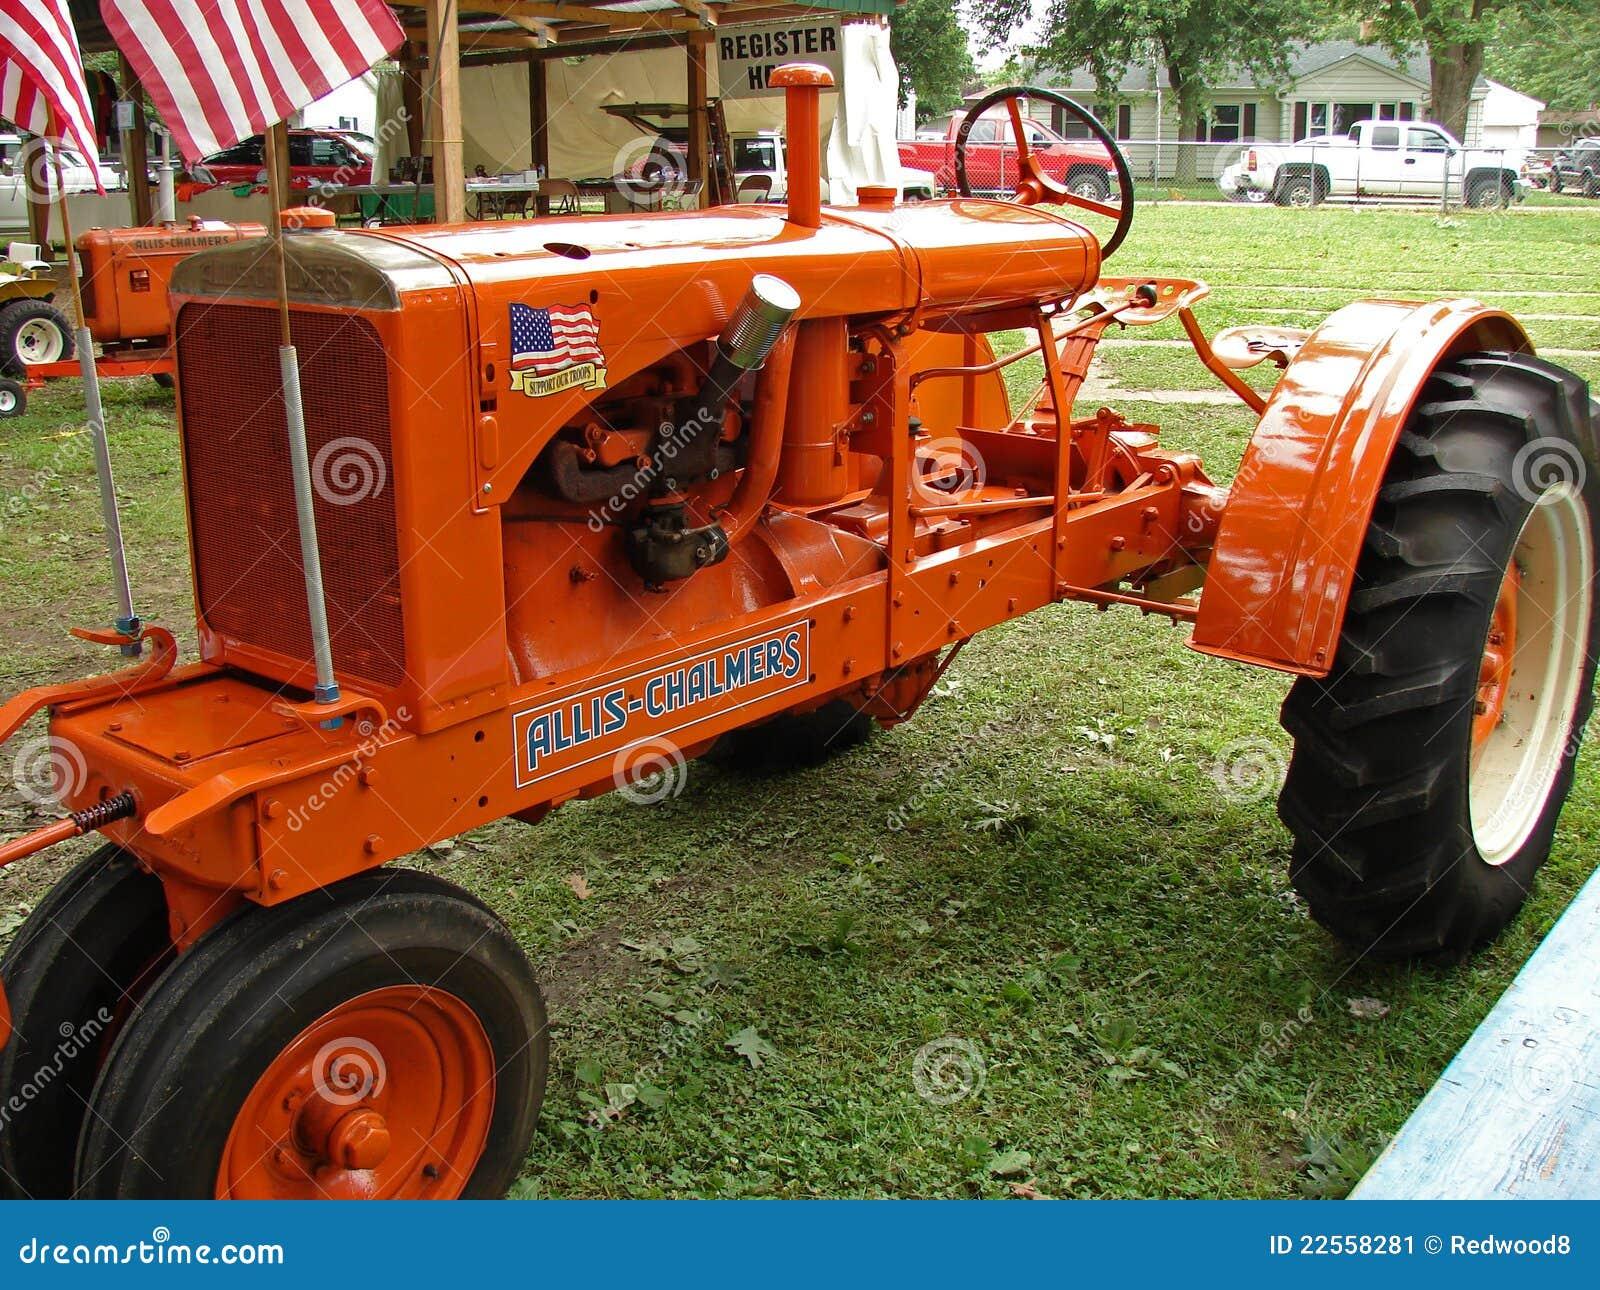 Vintage Allis Chalmers Tractors : Antique allis chalmers tractor editorial photo image of